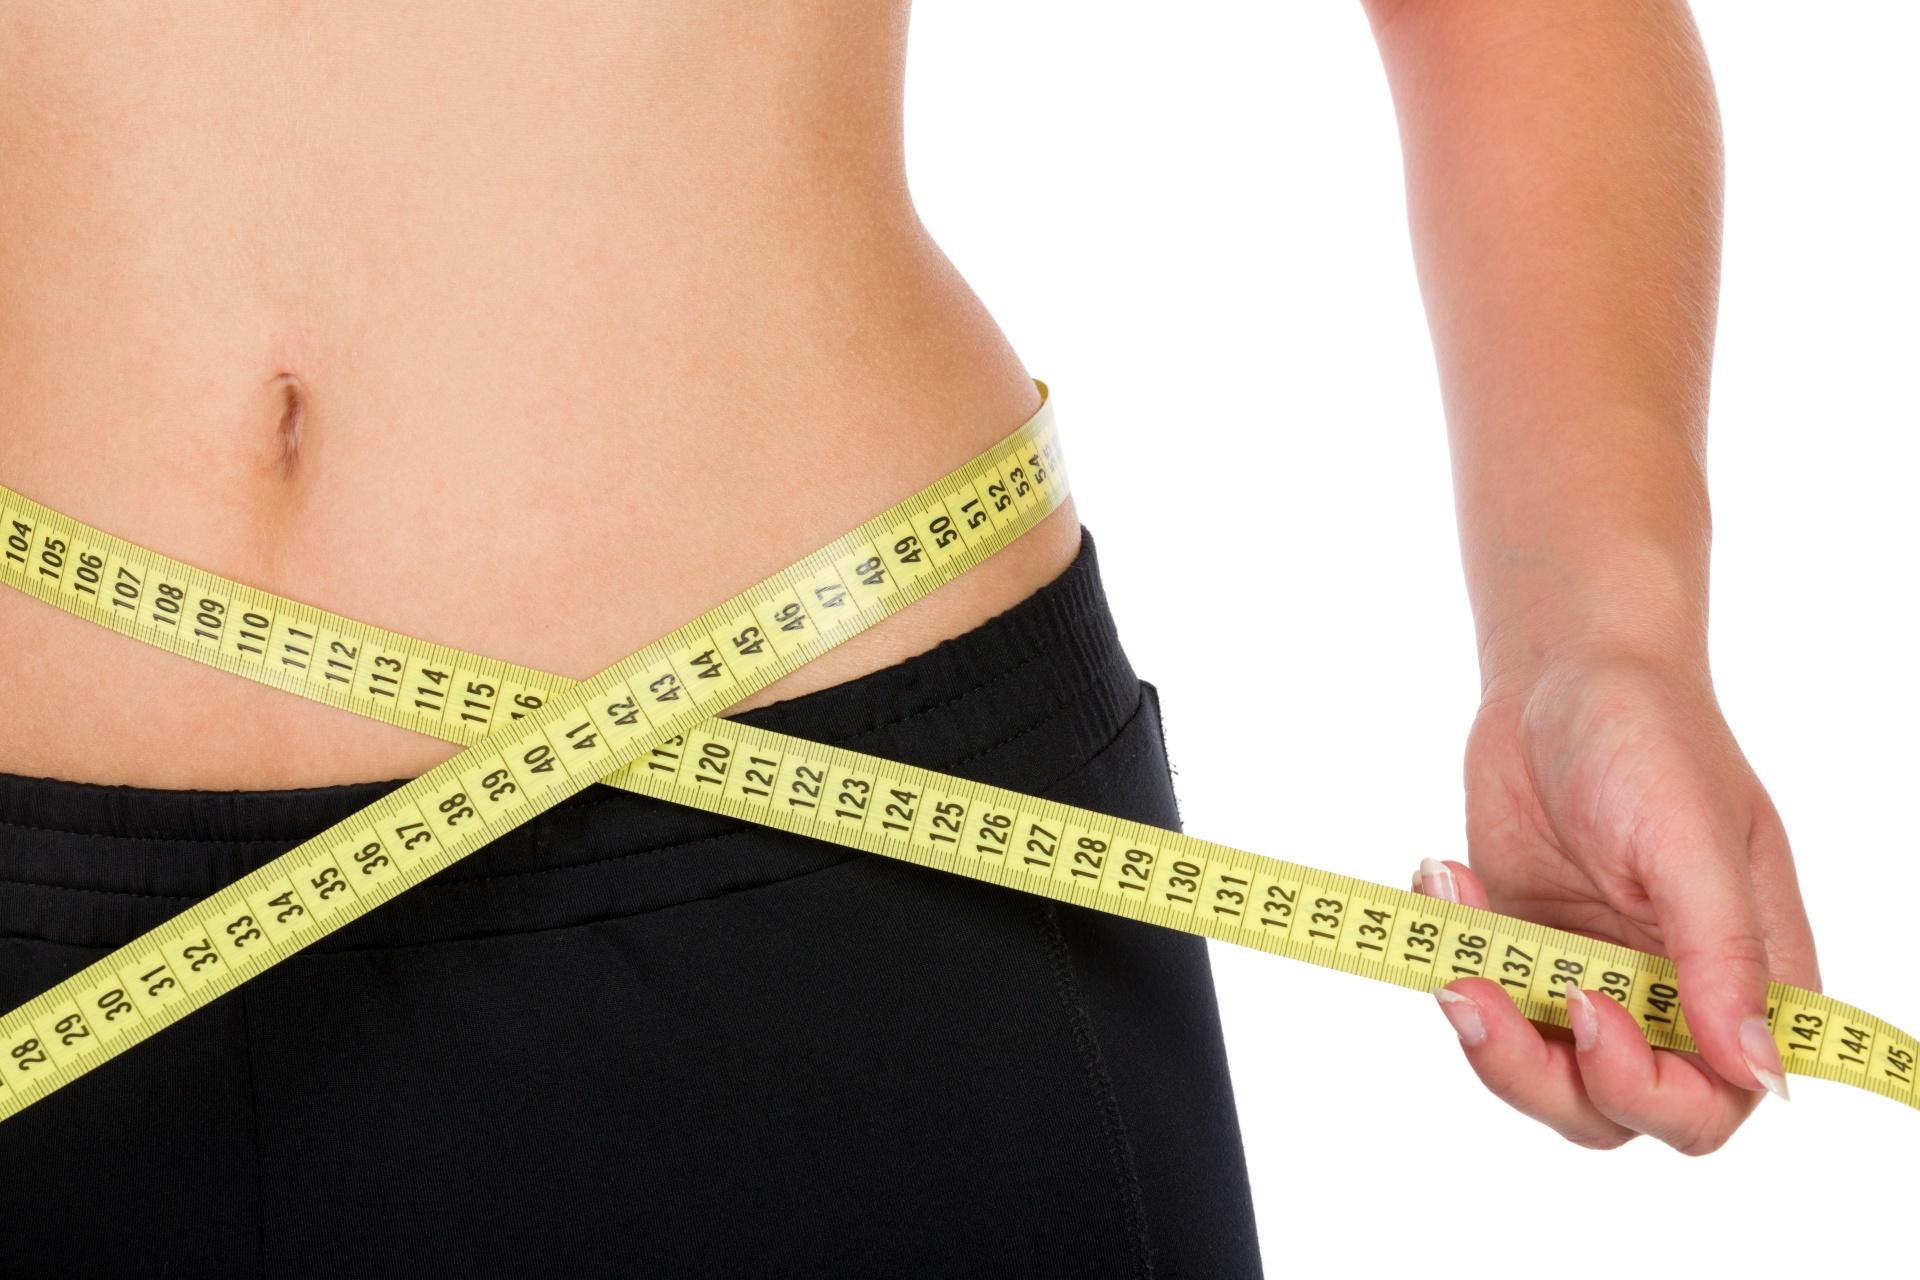 Obesità e sovrappeso: distinguerli e prevenirli